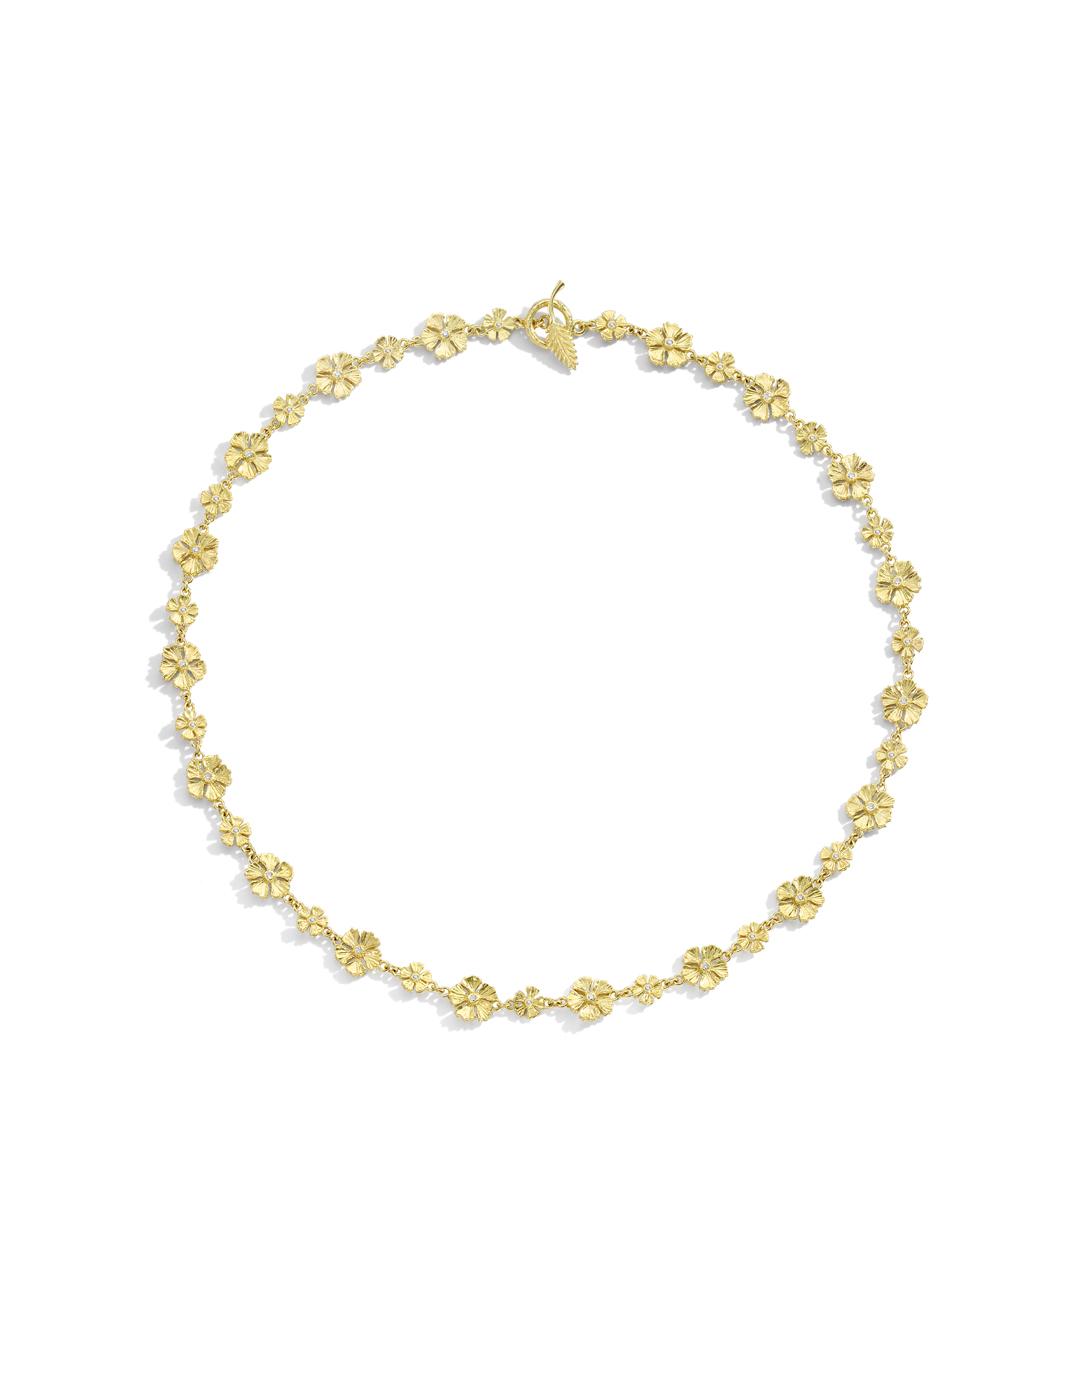 mish_necklaces_StrawFlwr-17inch-Chkr-All-Diam